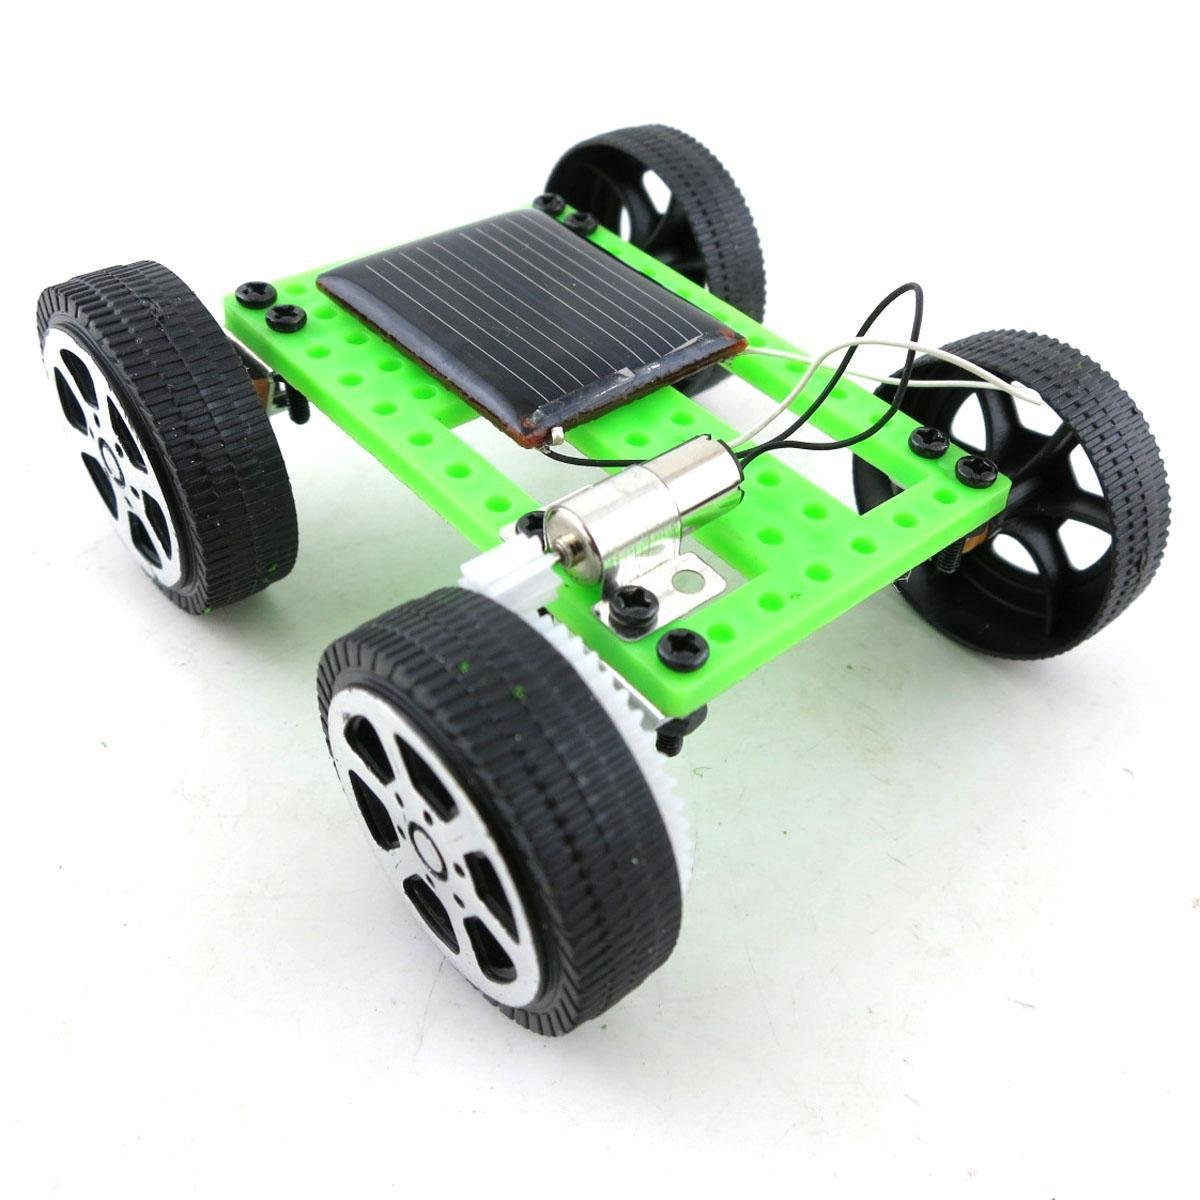 Exiron 1Pcs Mini Solar Toy DIY Car Children Educational Puzzle IQ Gadget Hobby Robot